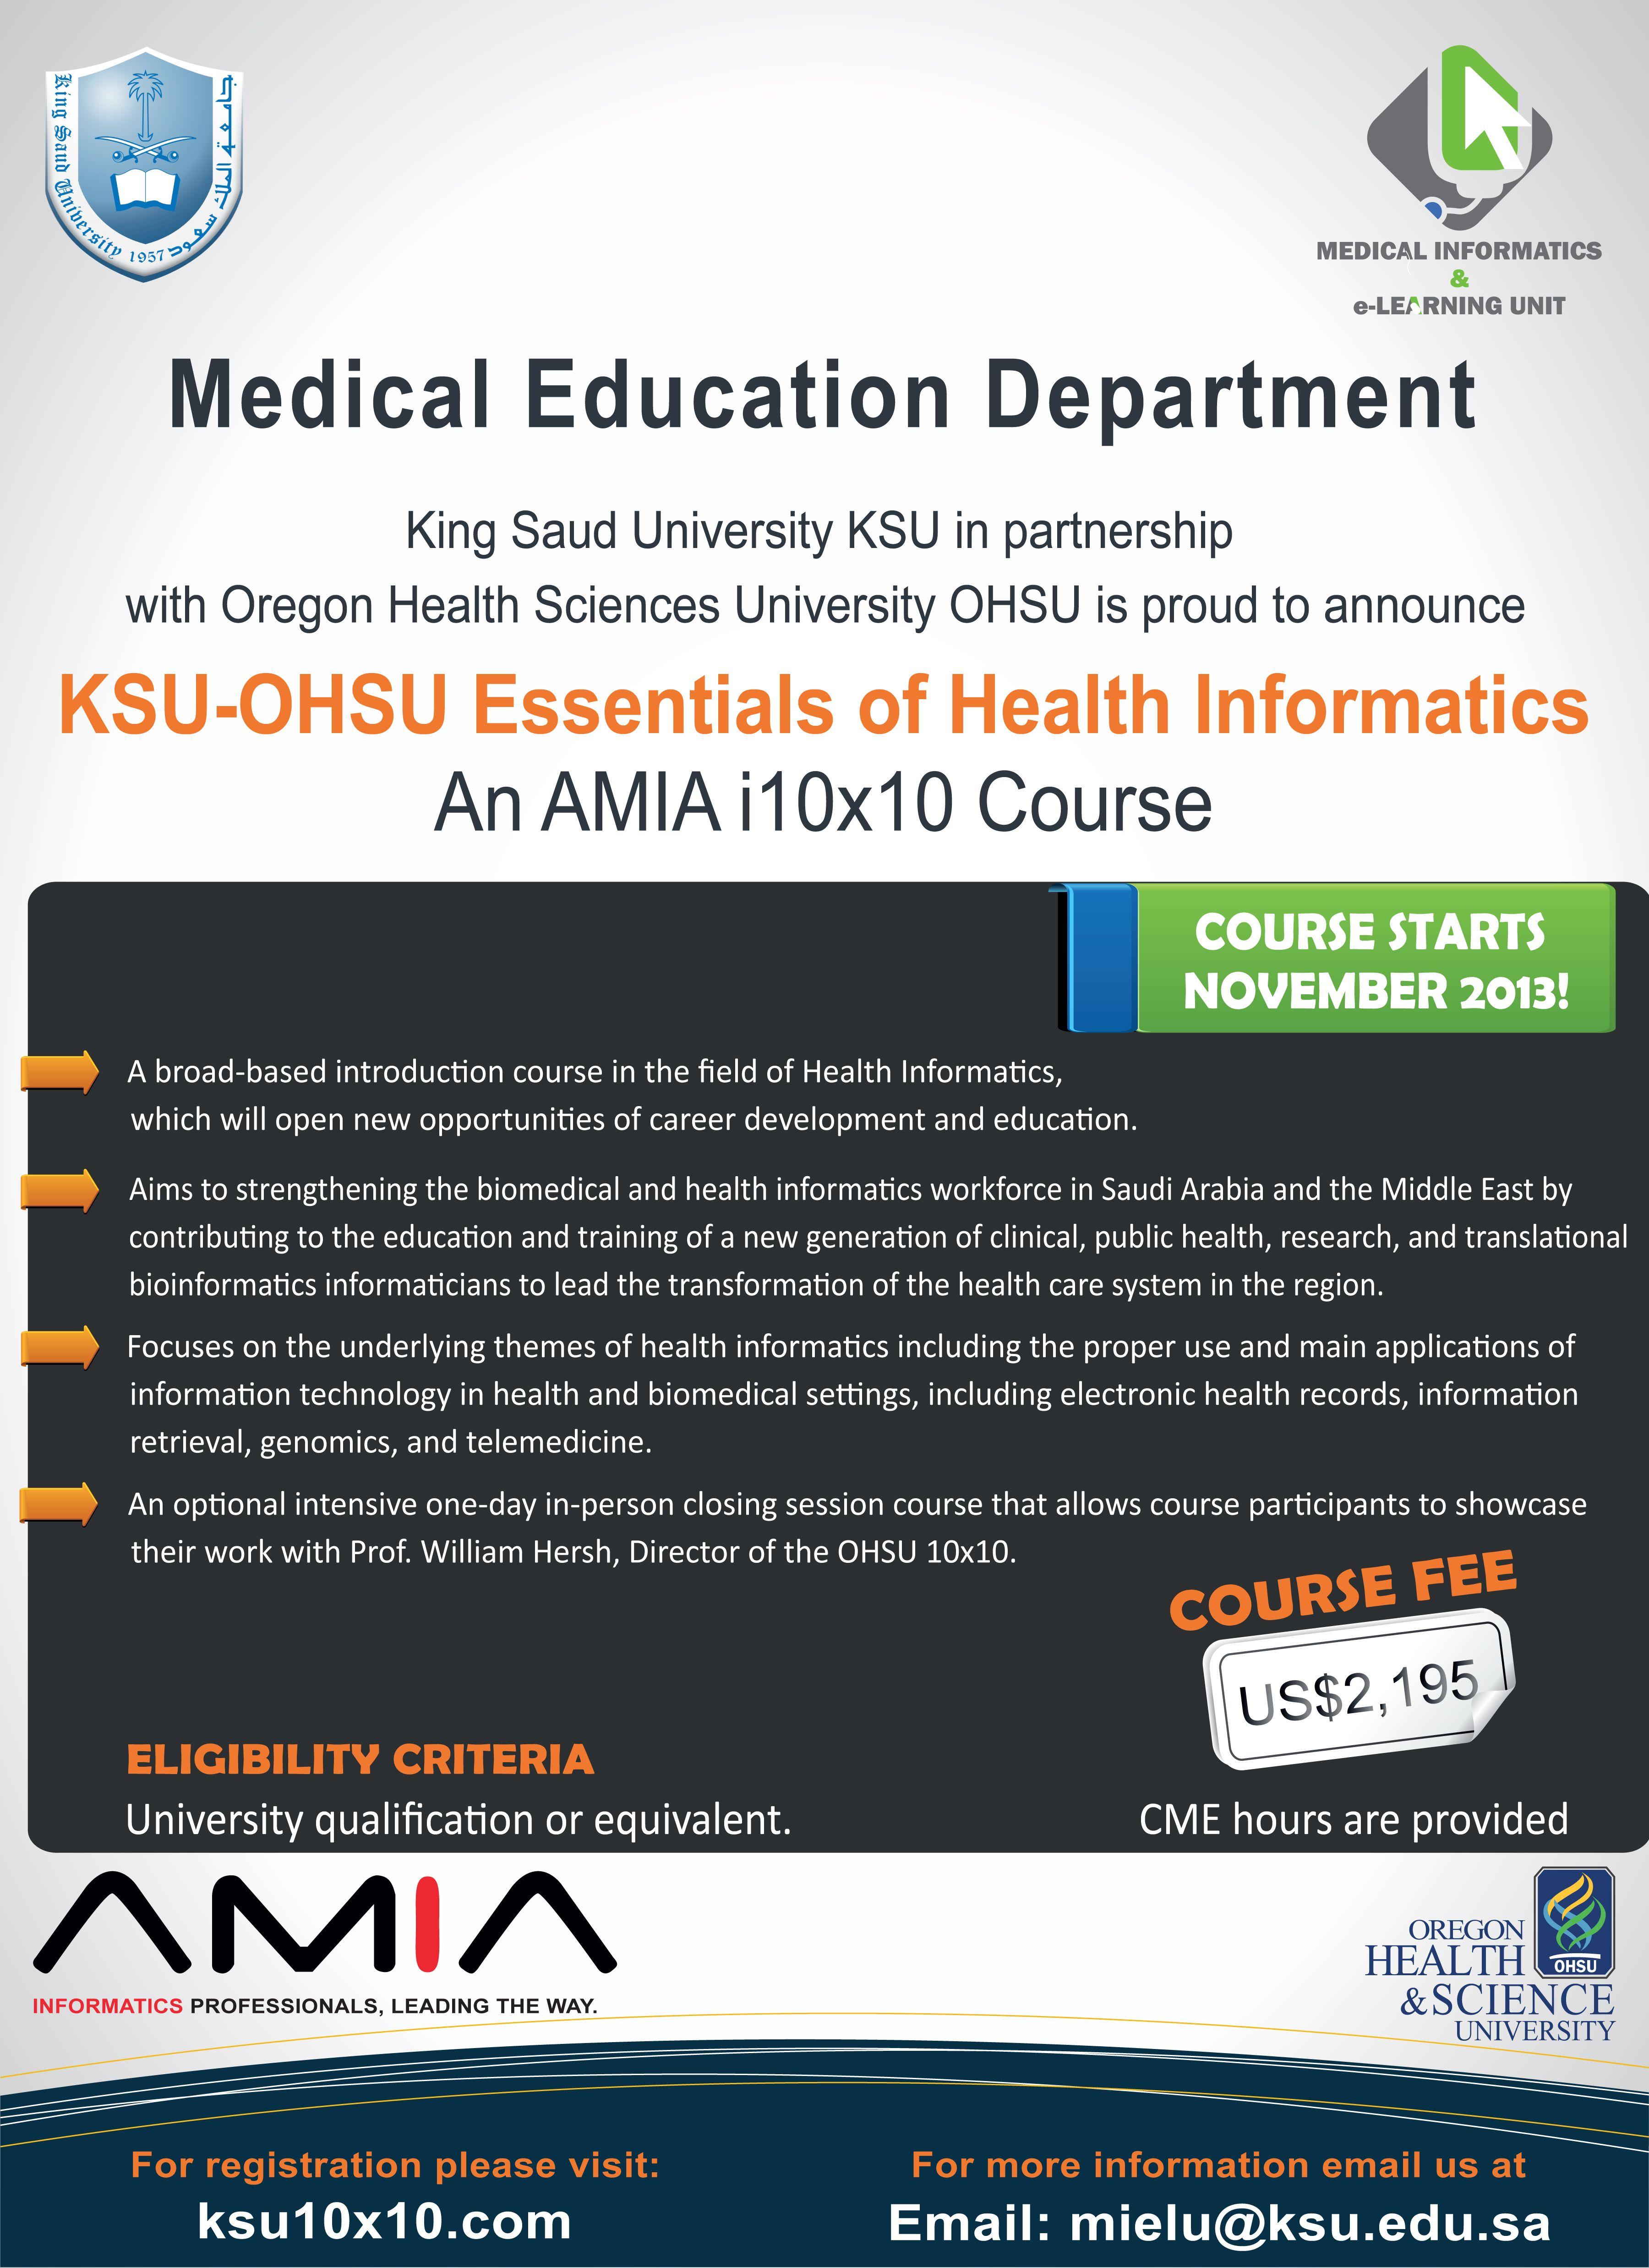 Medical Informatics Elearning Unit Ksumielu Profile Pinterest